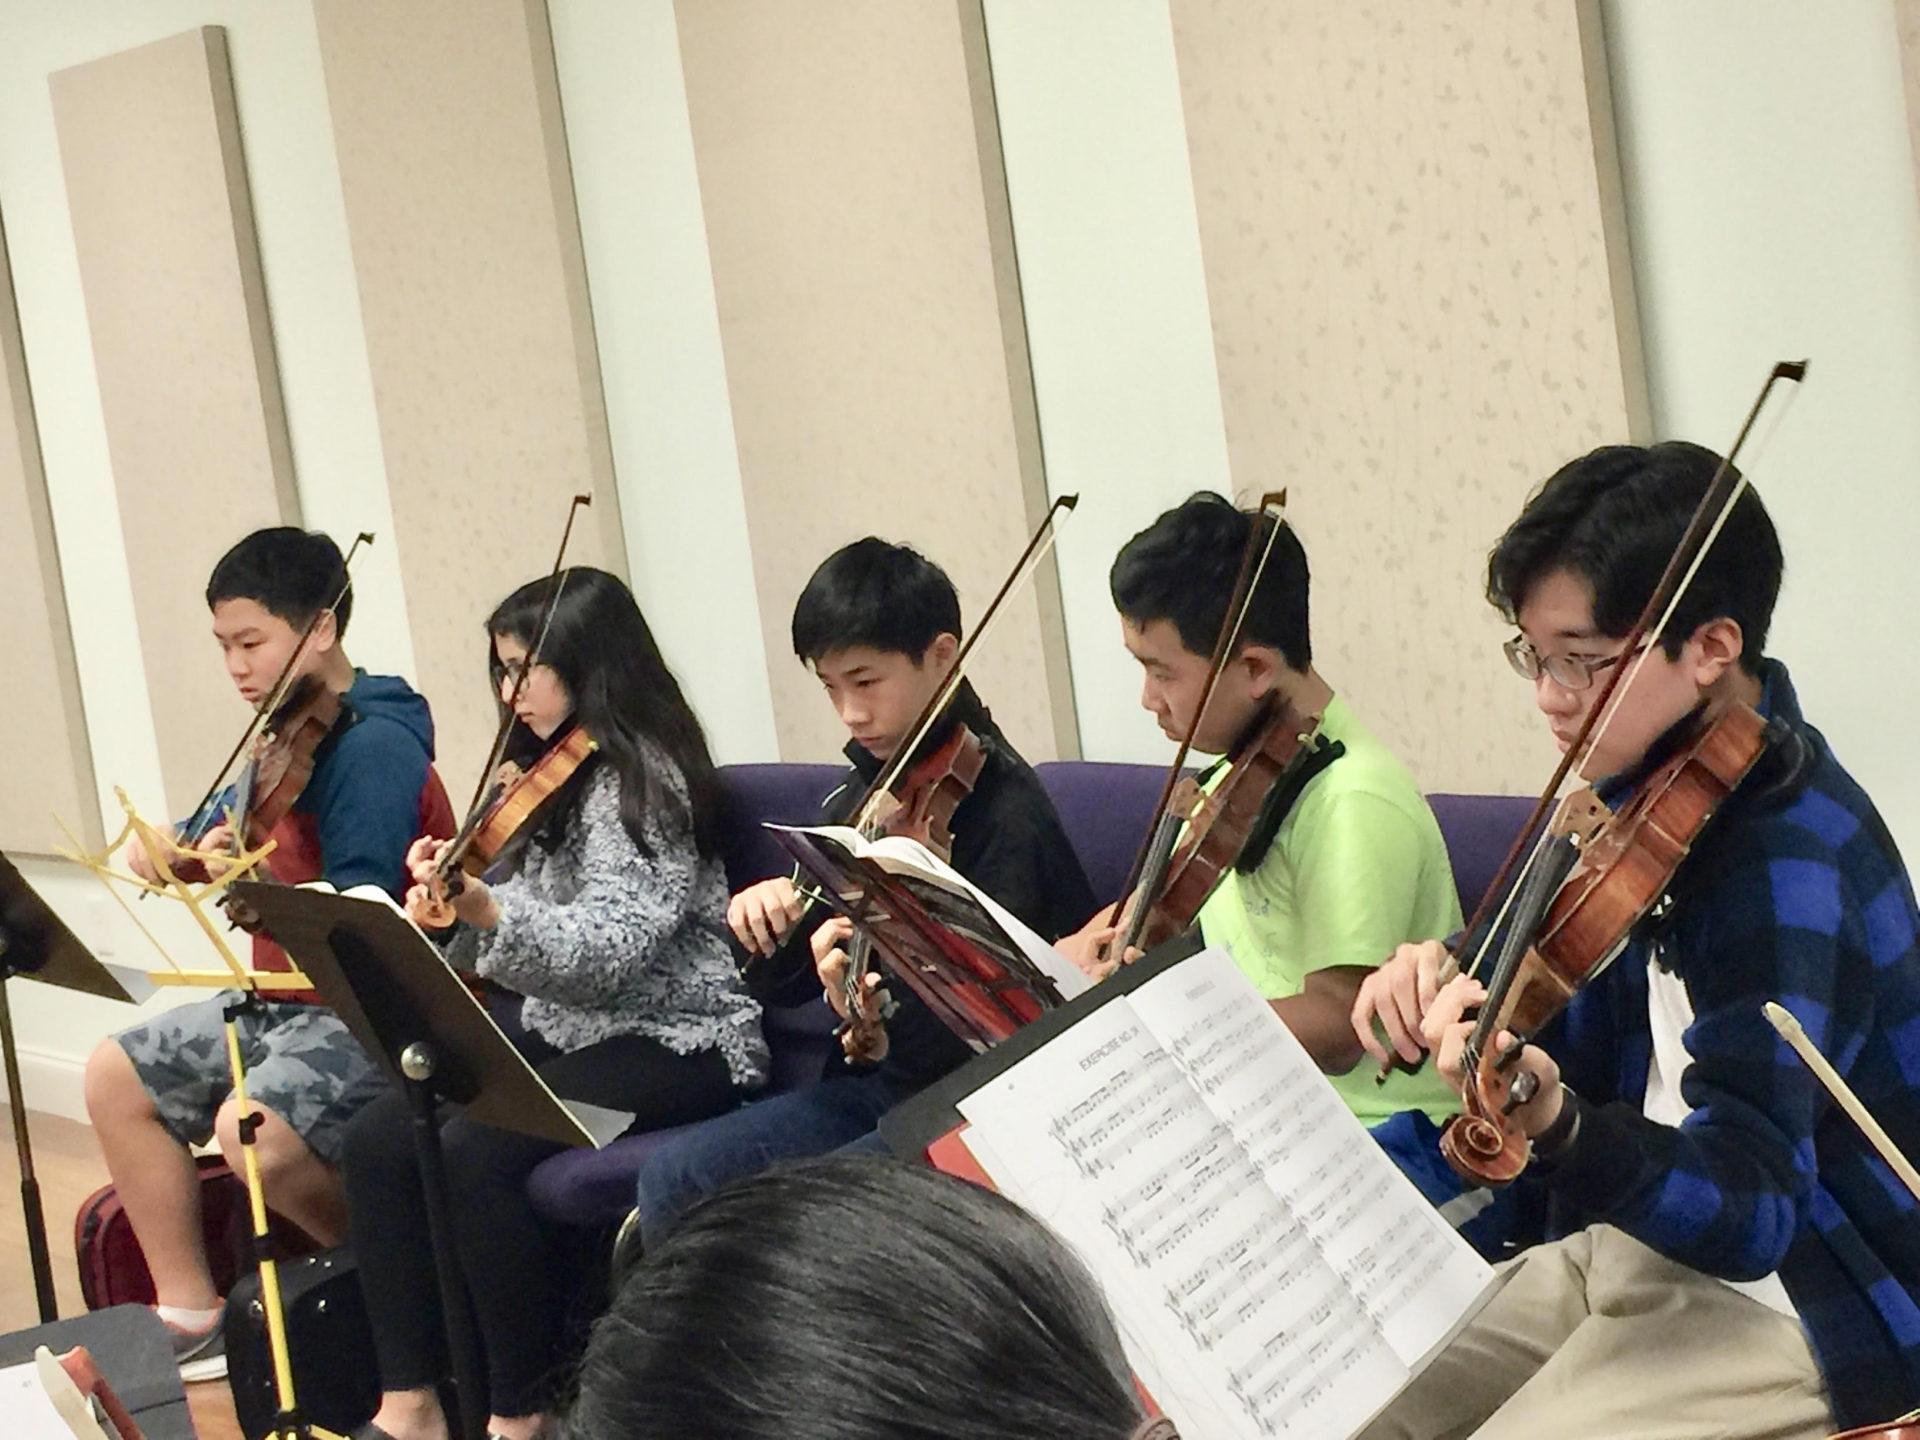 Sight-Reading Class – William Pu Music Academy